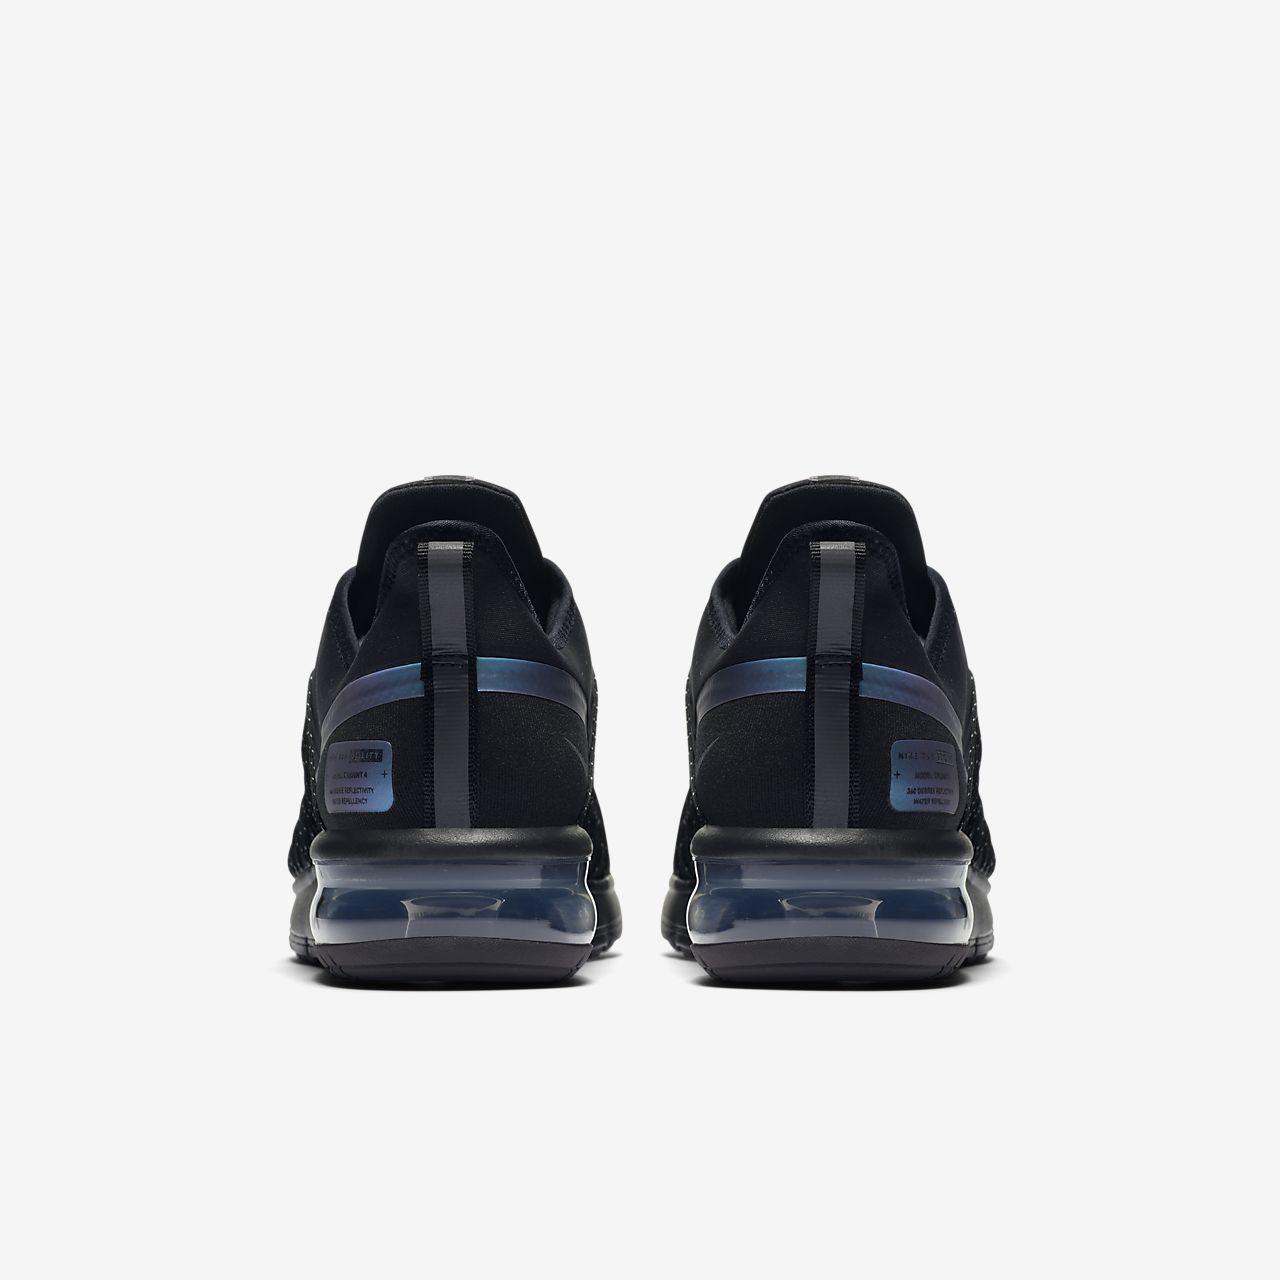 464634e283 Nike Air Max Sequent 4 Shield Men's Shoe. Nike.com ID